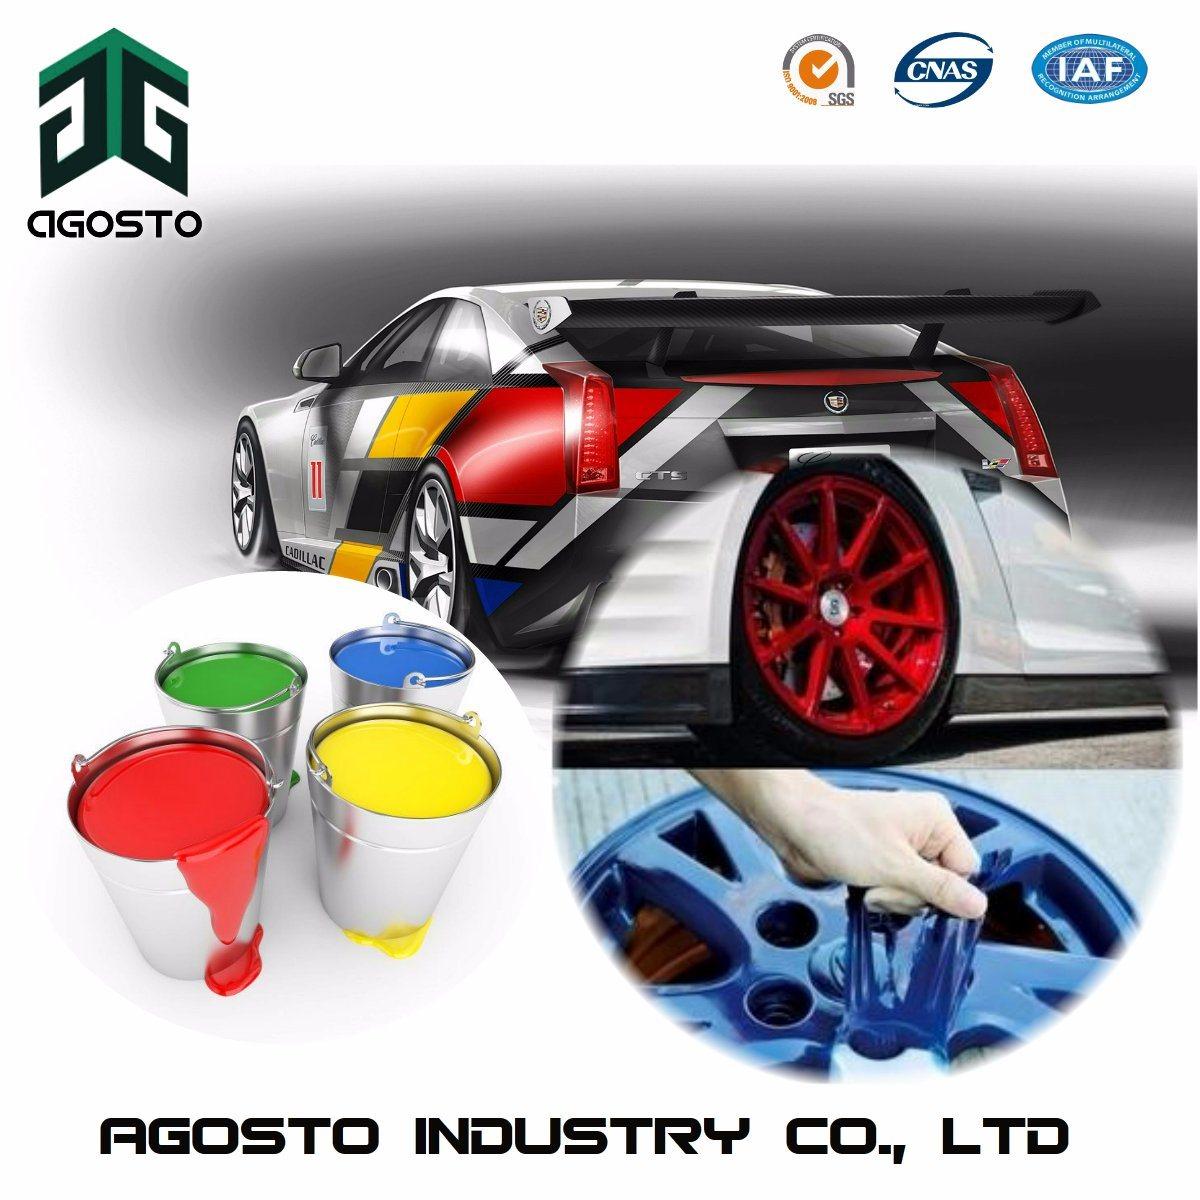 Hot Sale Acrylic Spray Paint for Car Usage